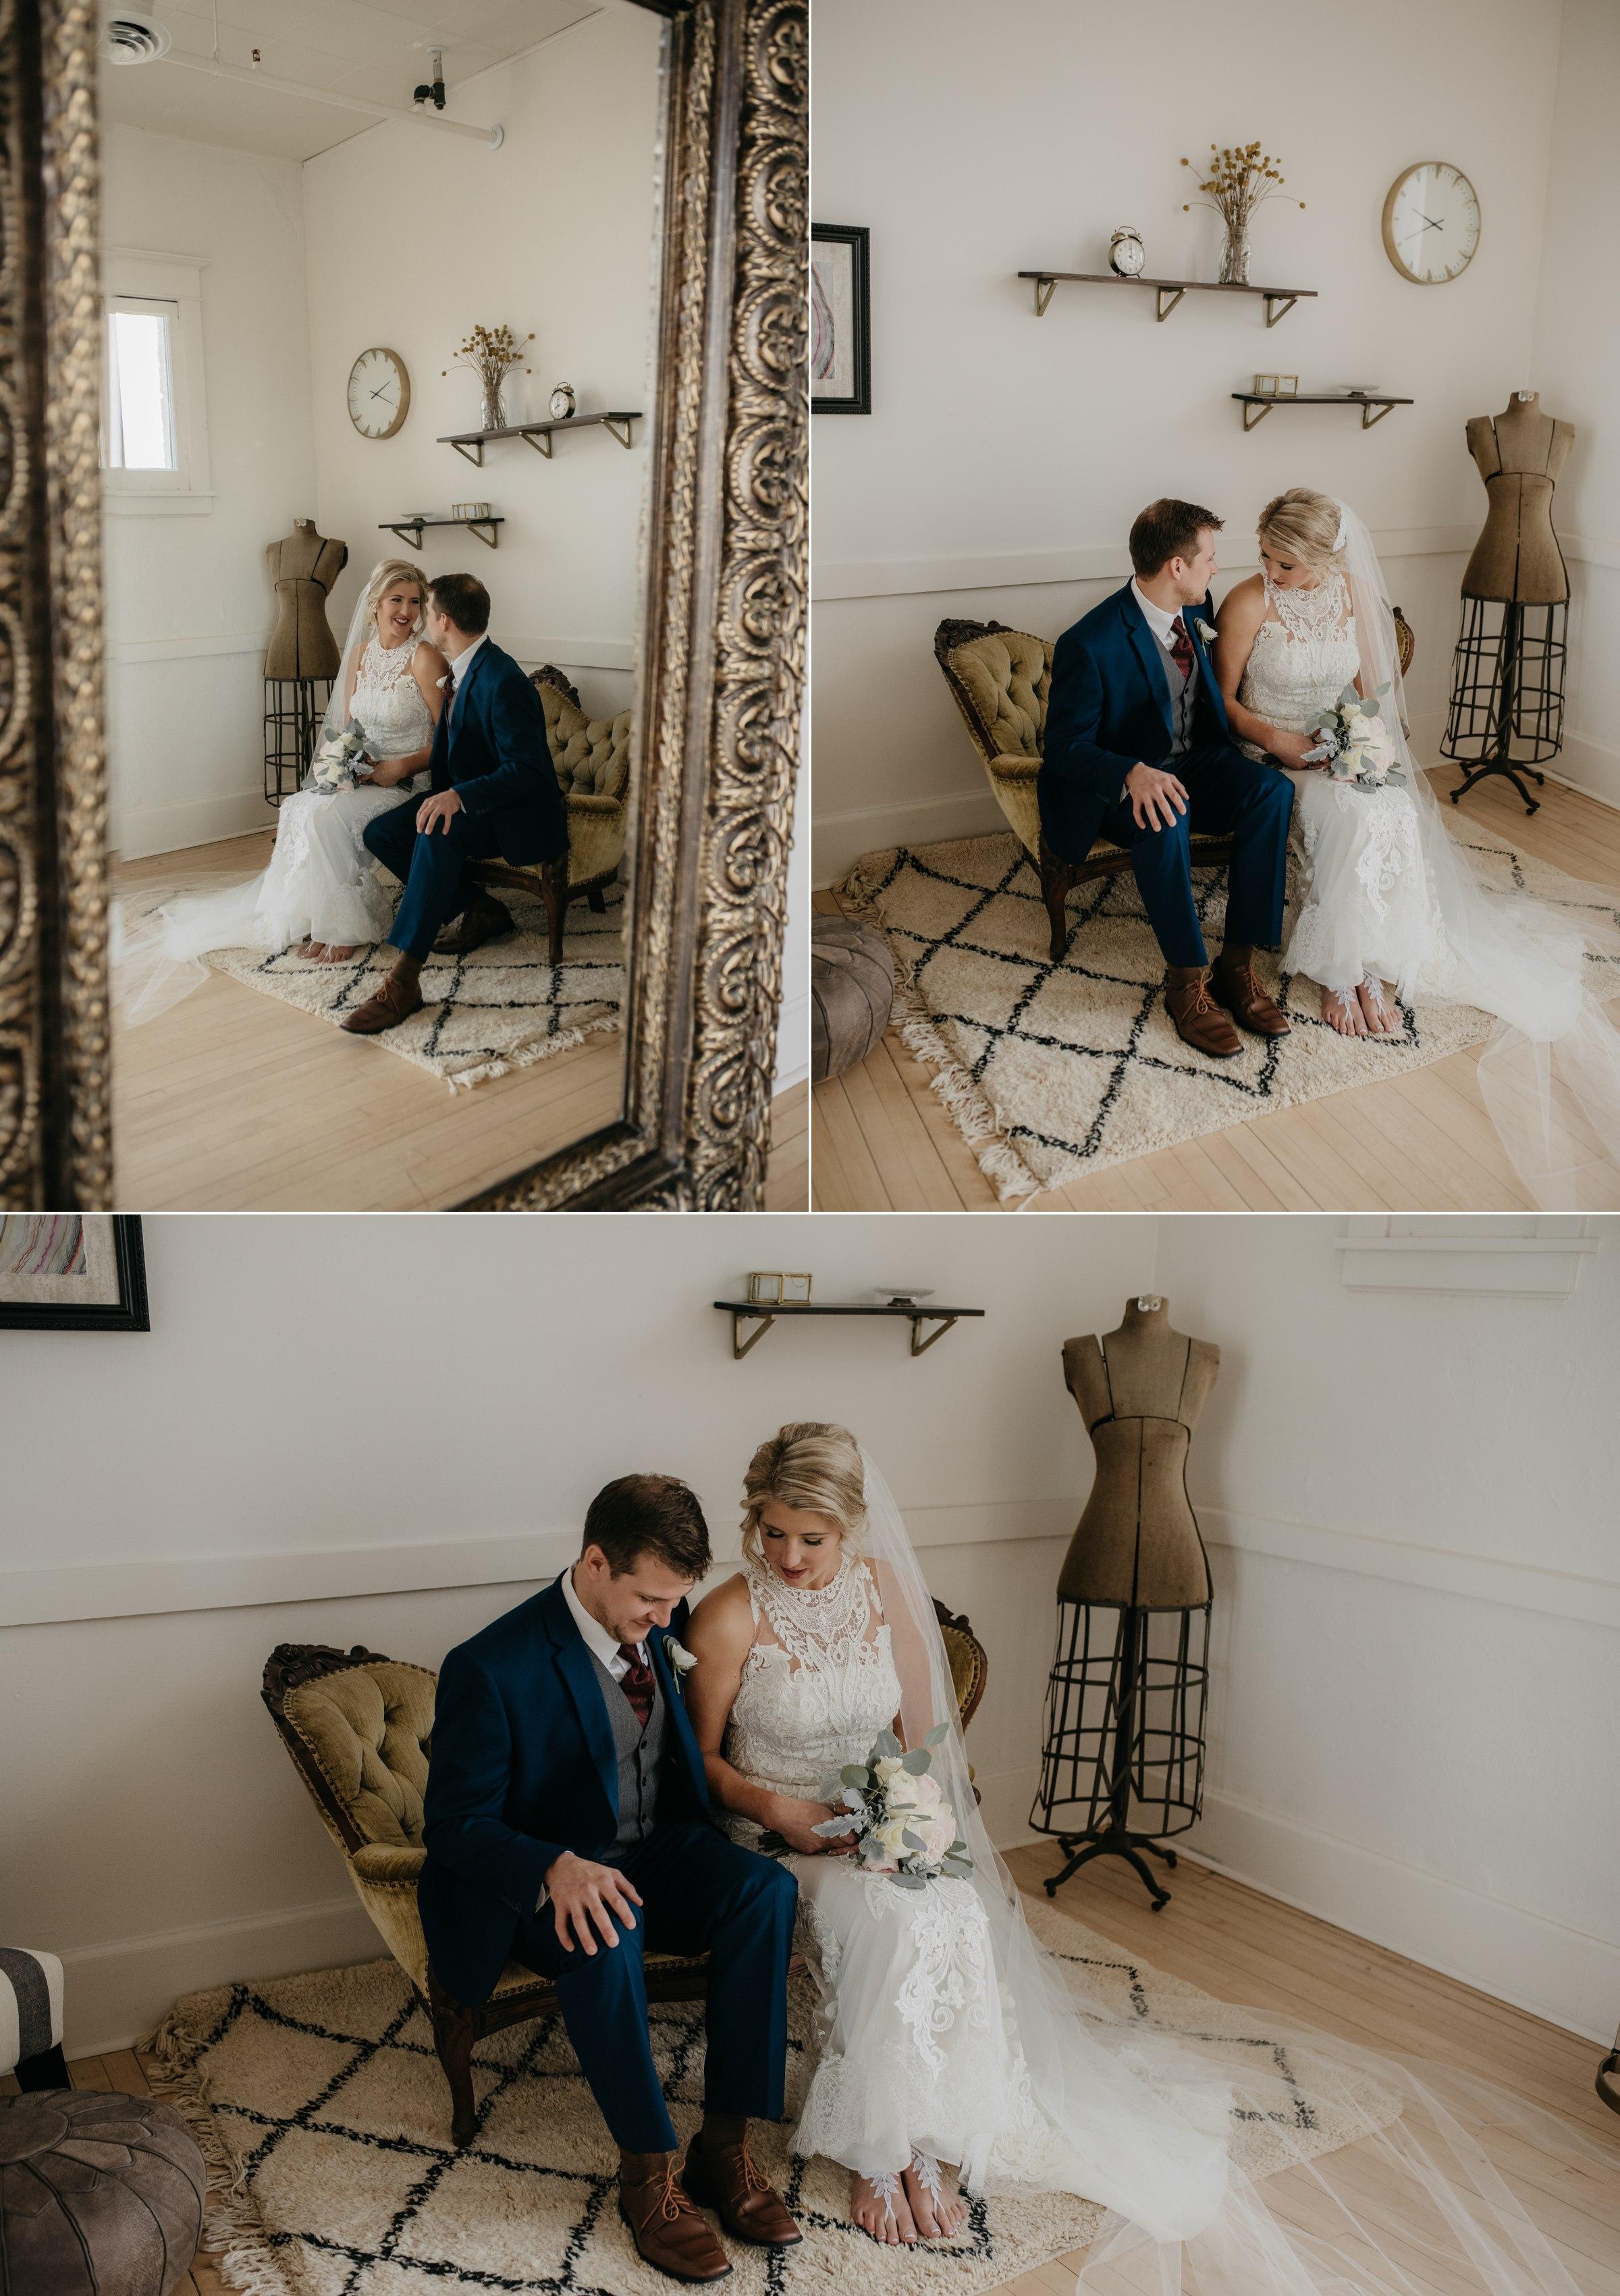 elopement-photographer-austin-best-wedding-minneapolis-adventurous-wedding-modern-morocco-new york-new orleans-mexica-costa rica-italy-affordable-best_0043.jpg